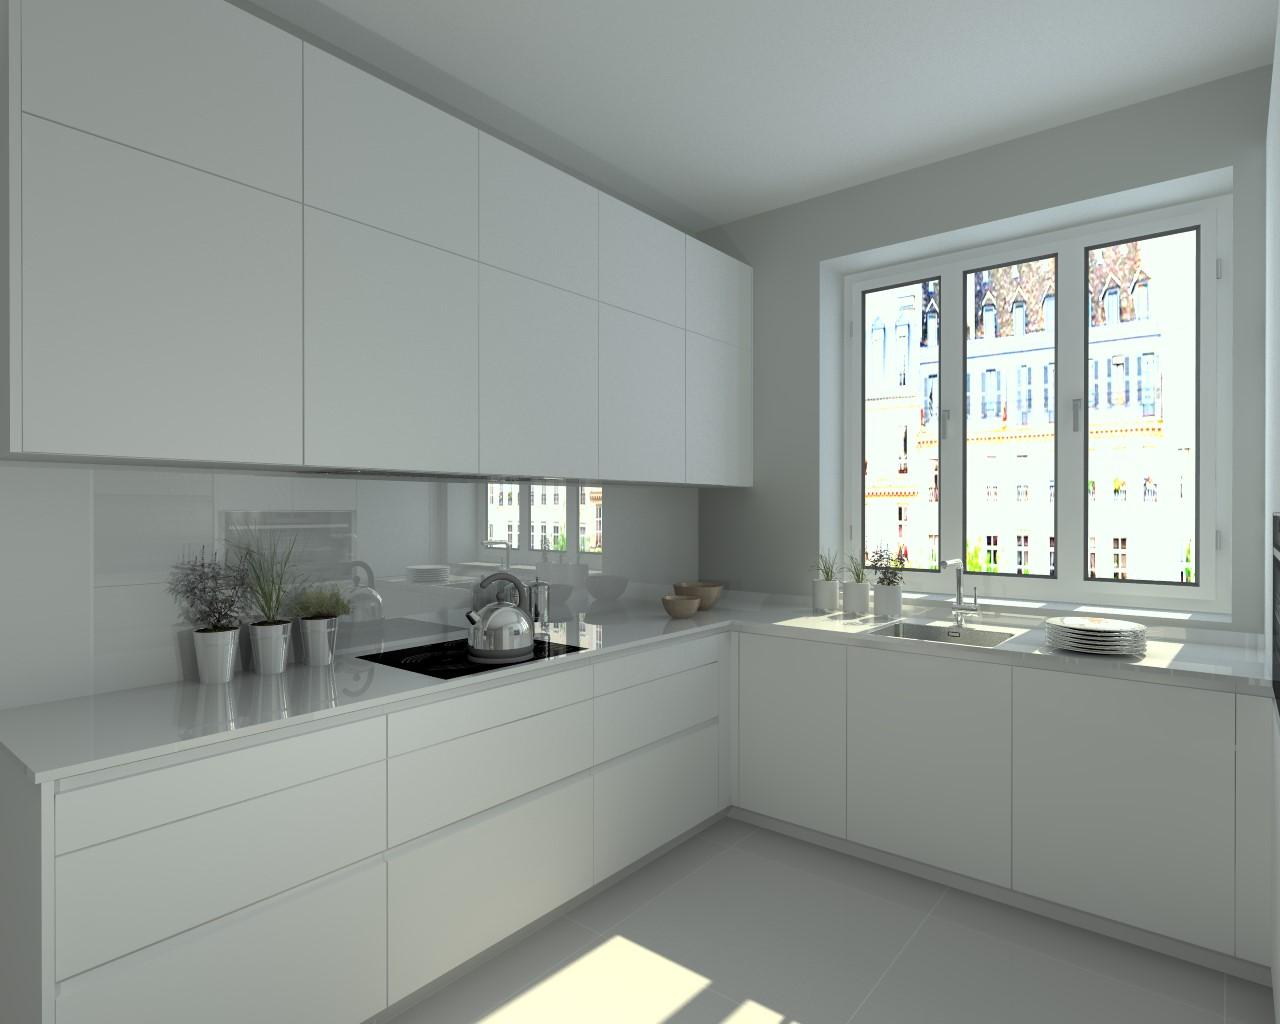 Aravaca cocina santos modelo line e blanco encimera for Cocinas modernas blancas precios